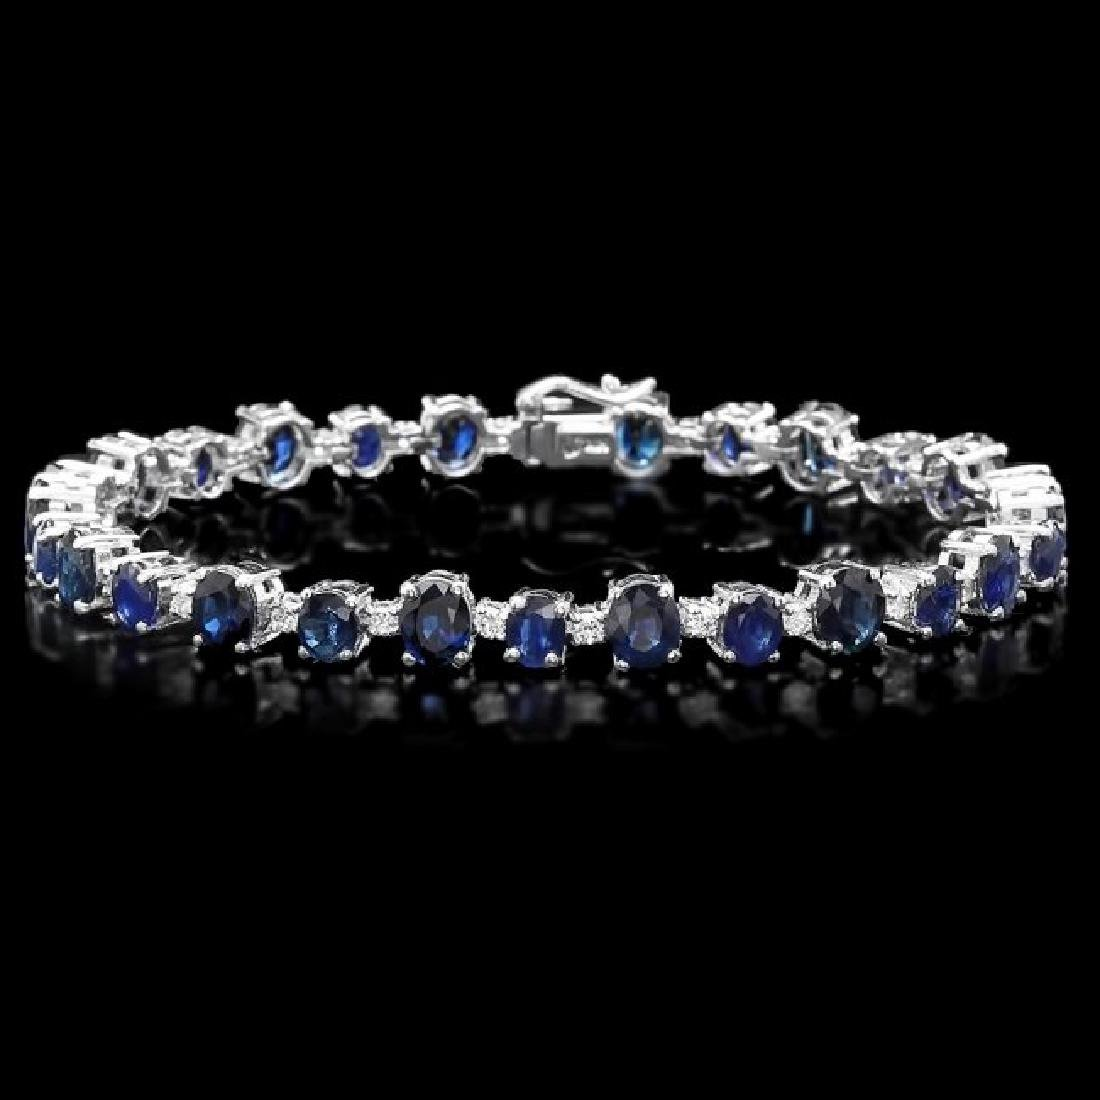 14k Gold 16.30ct Sapphire 1.10ct Diamond Bracelet